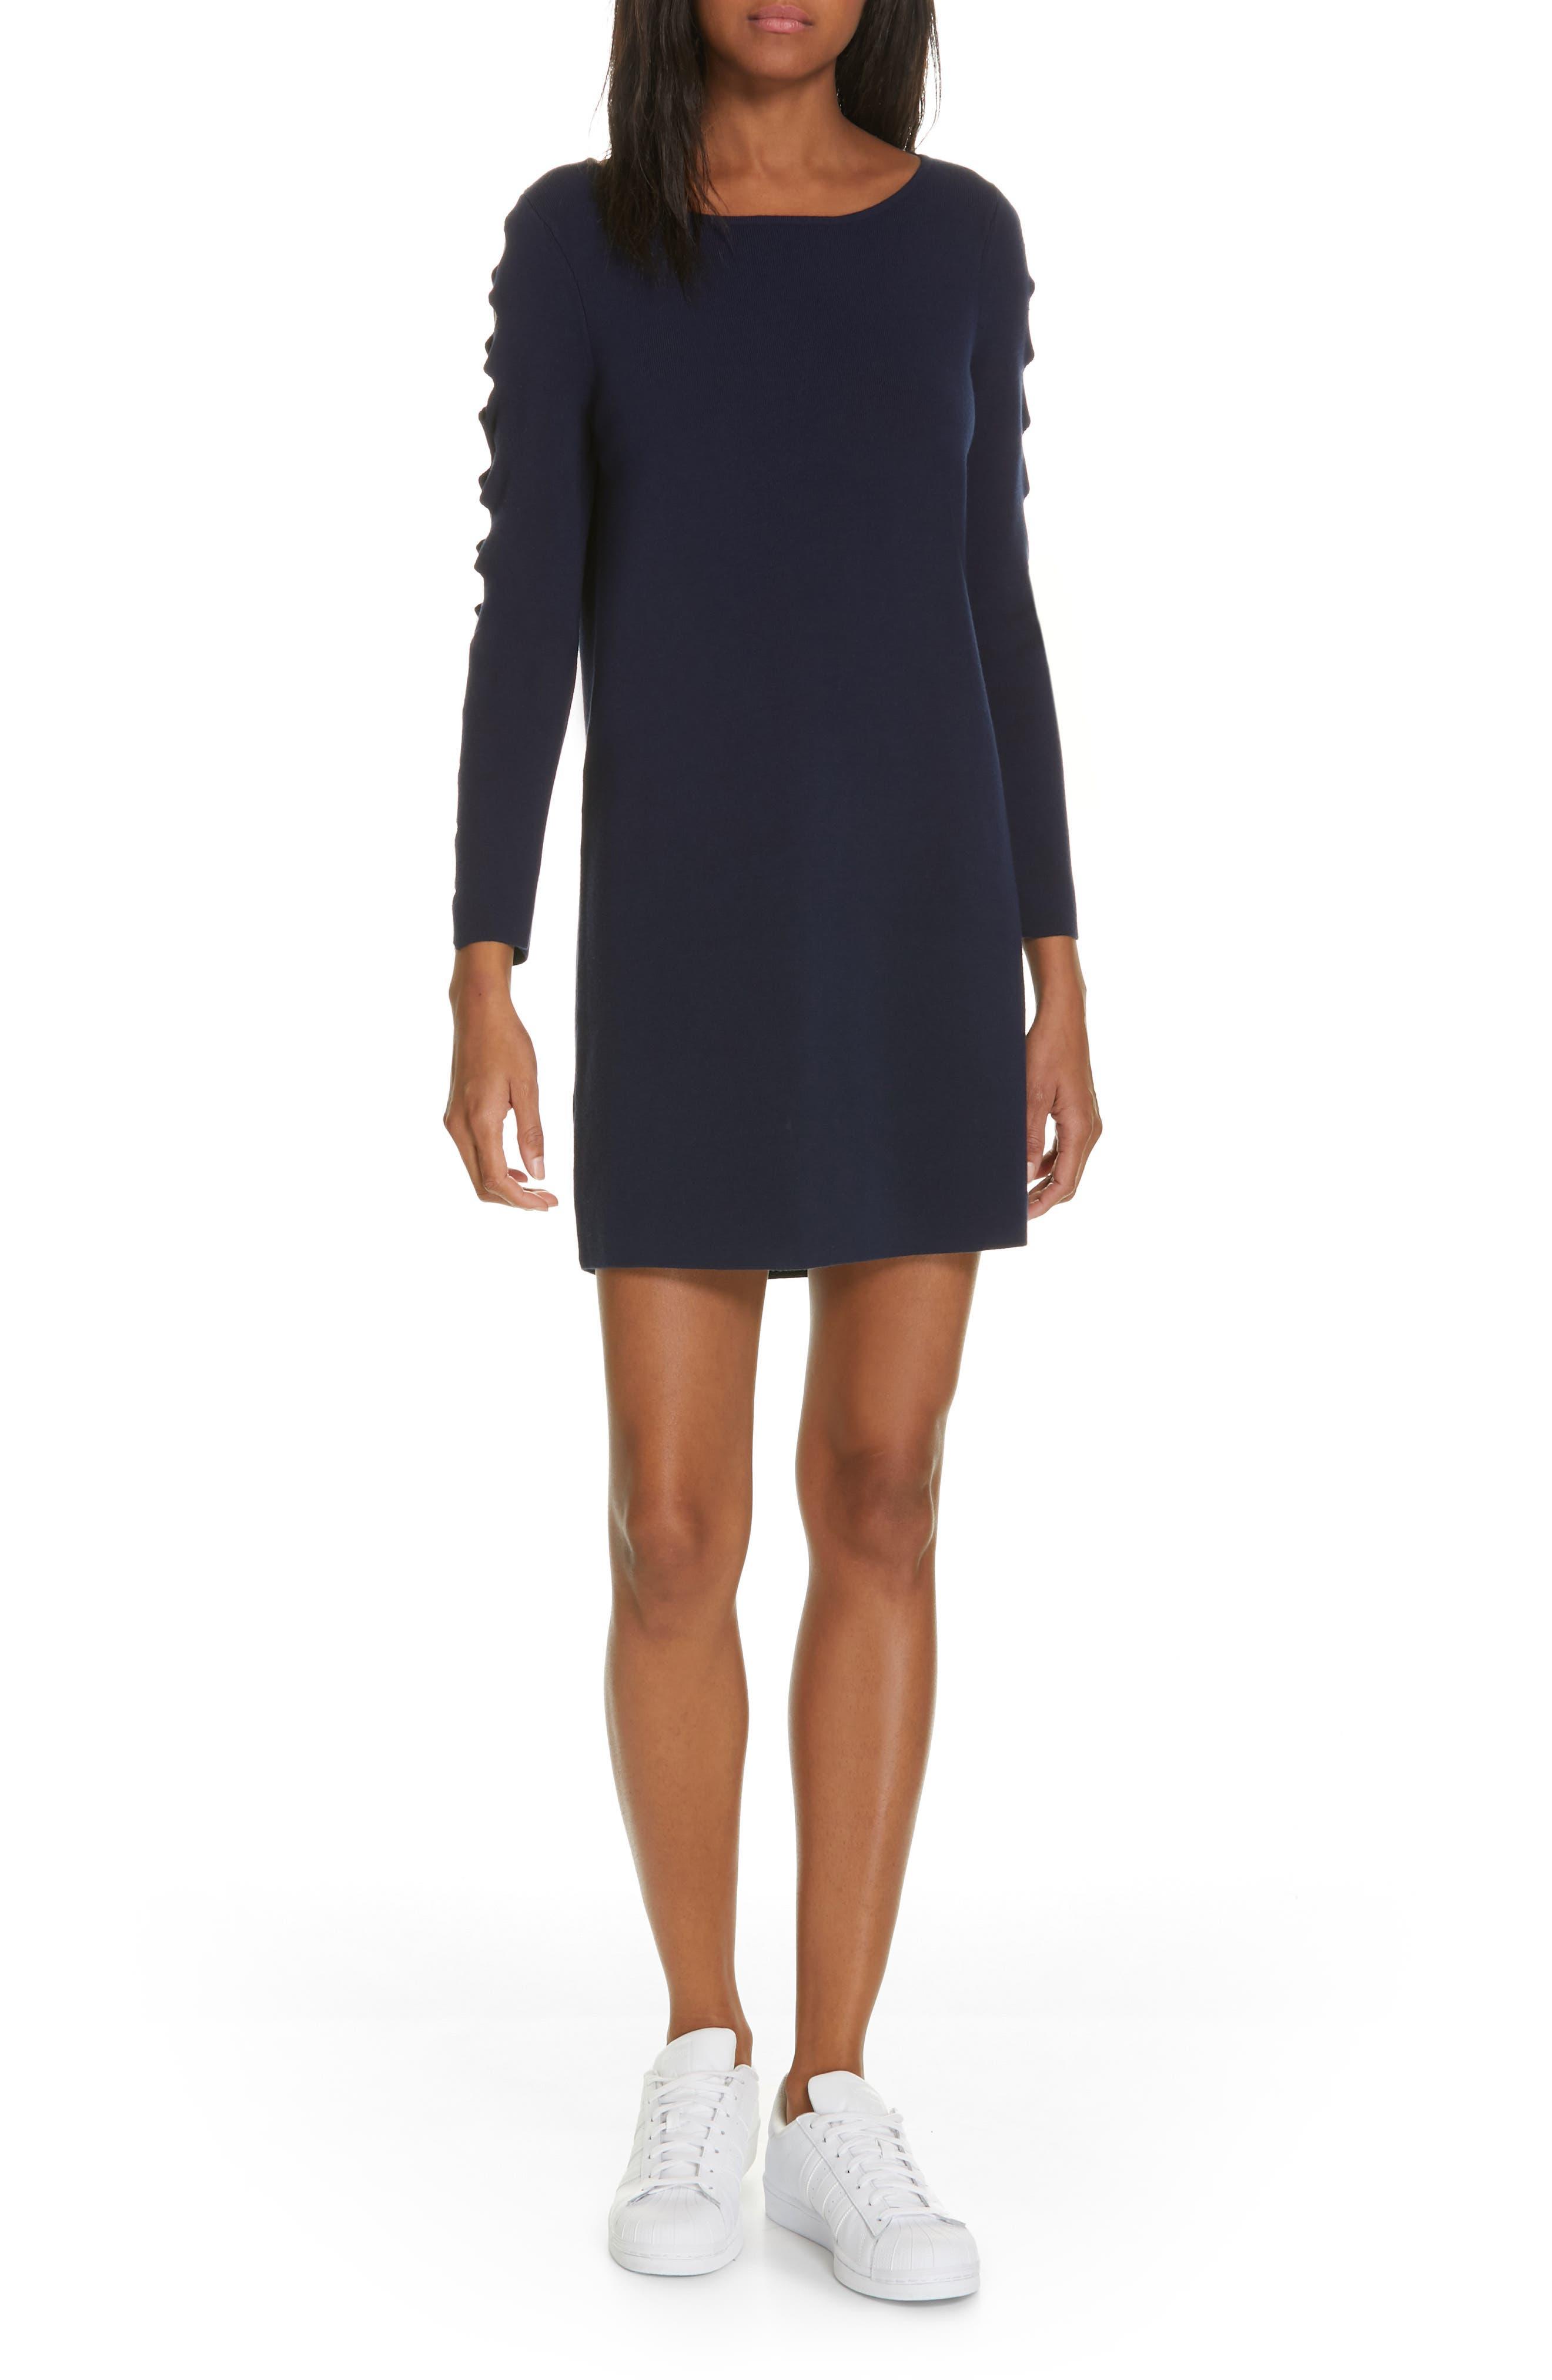 Milly Scallop Sleeve Shift Dress, Size Petite - Blue